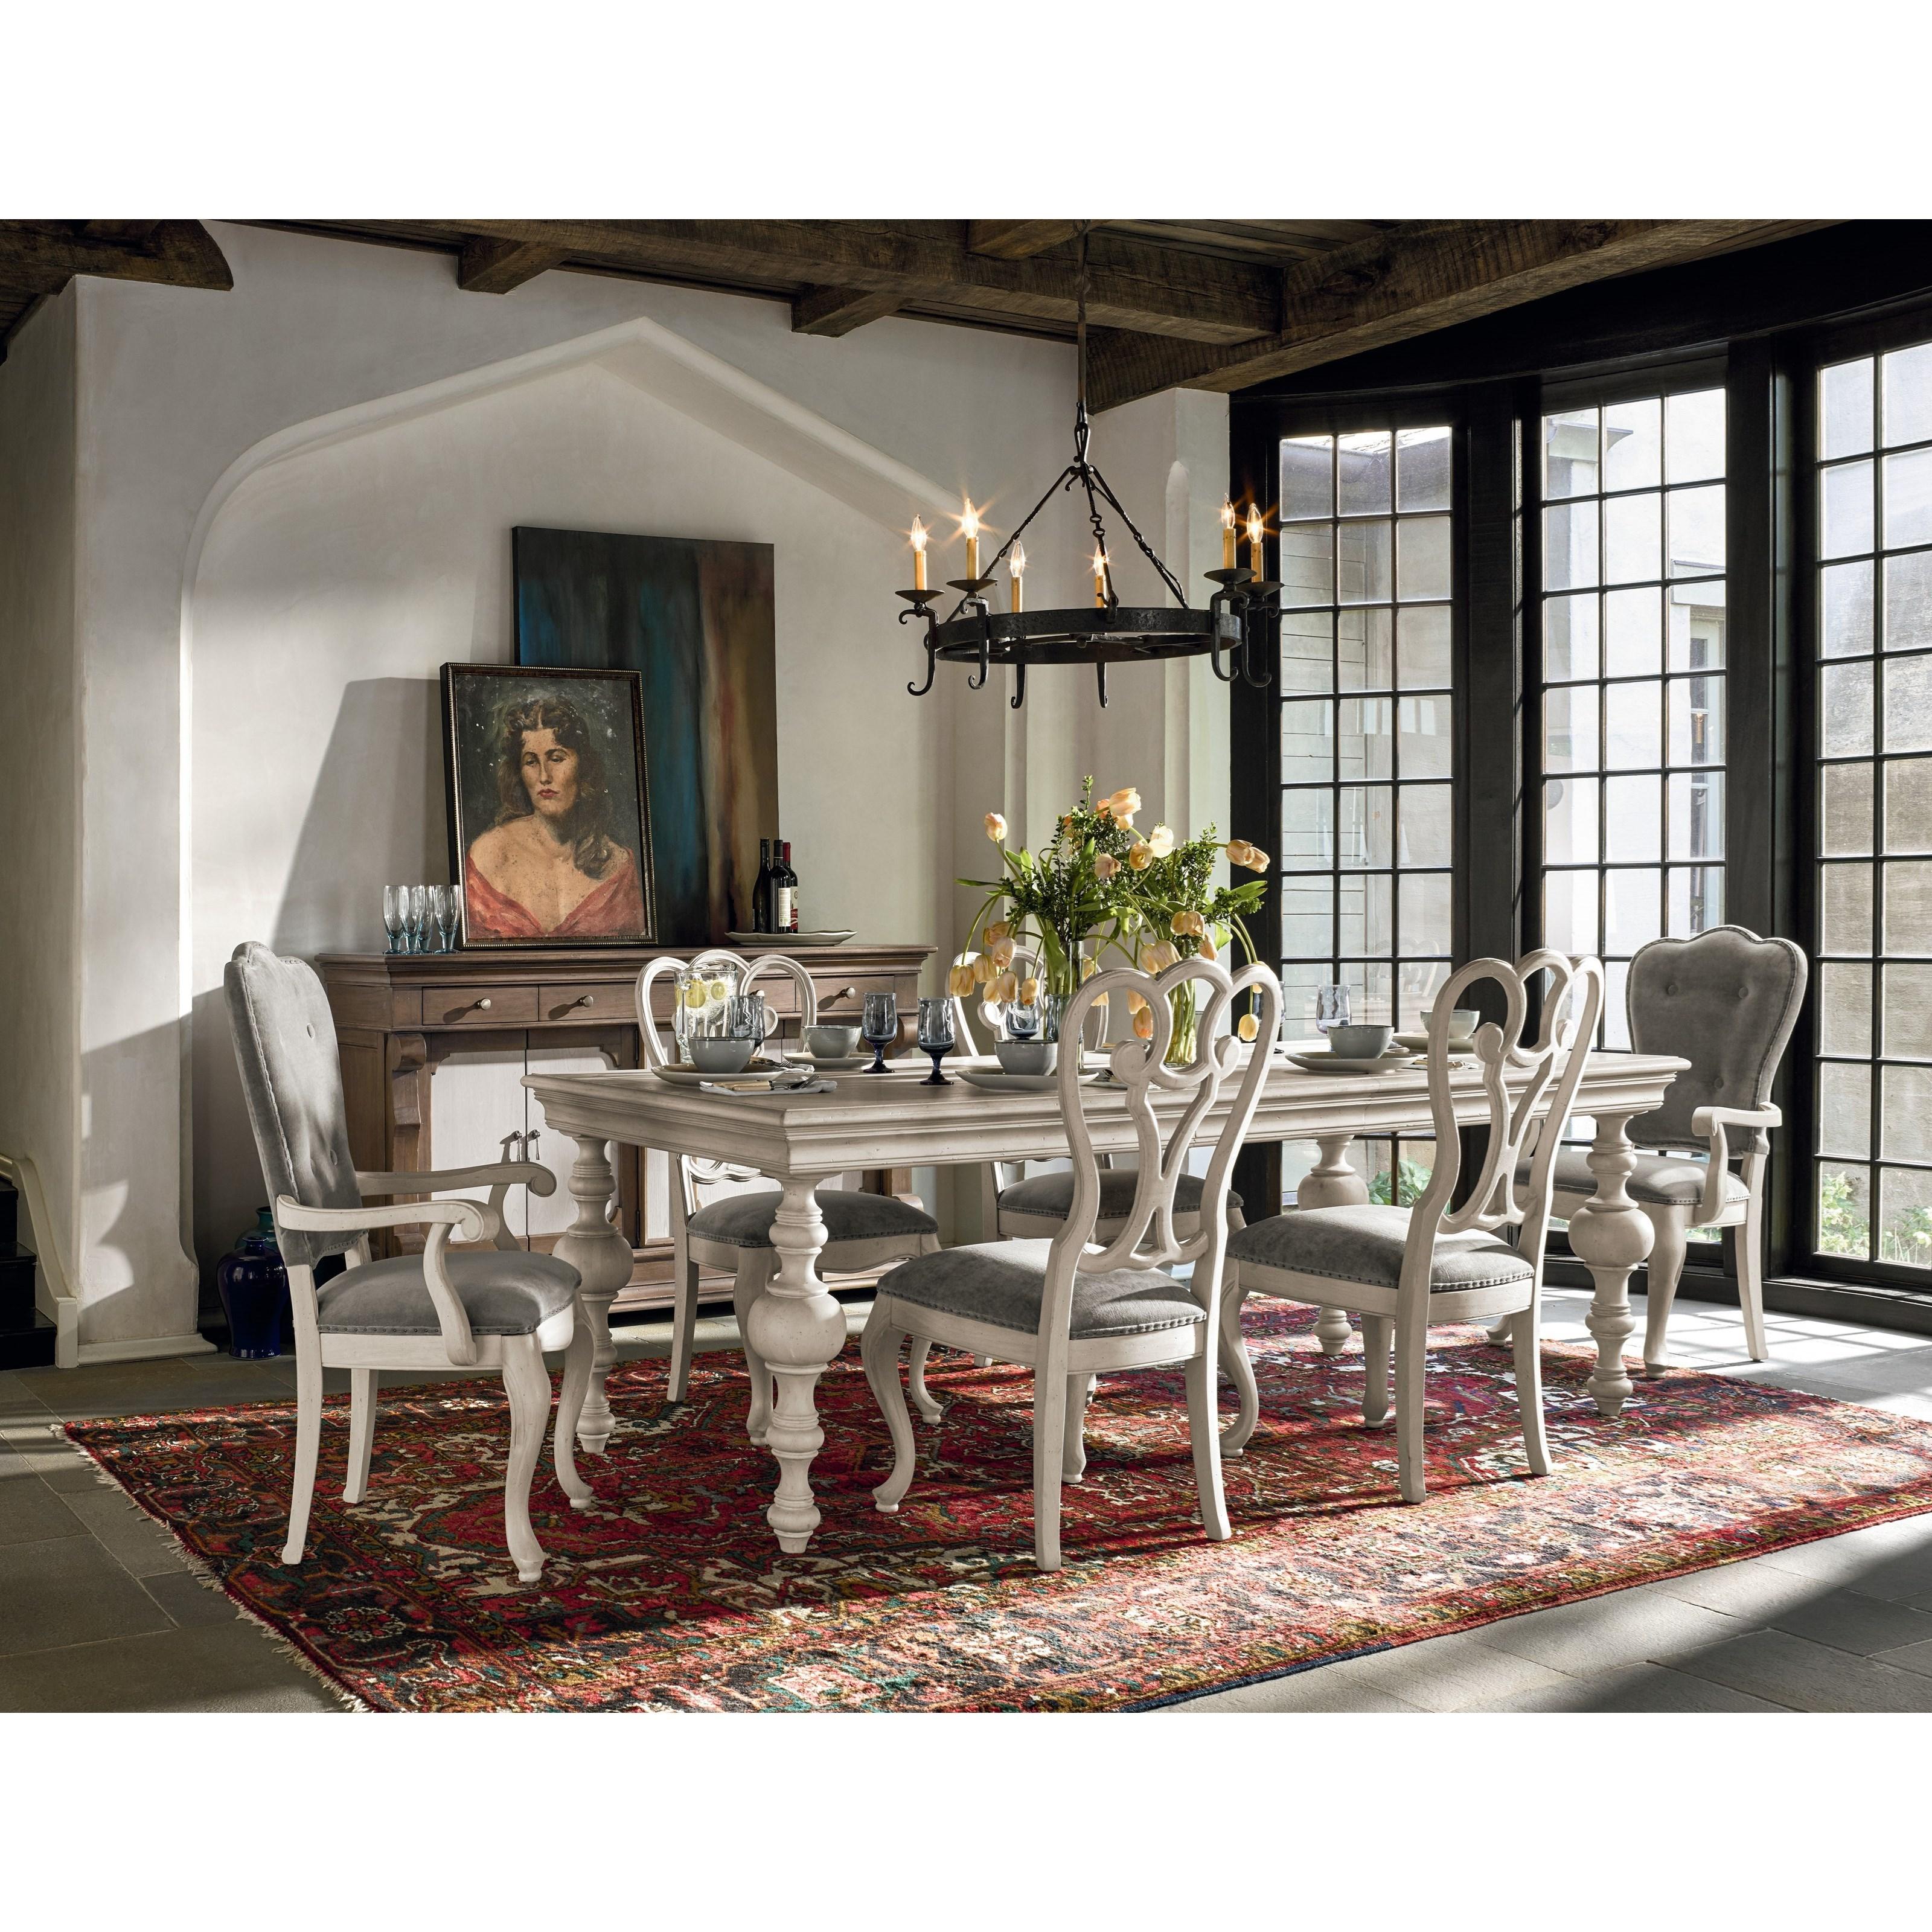 Universal lan traditional formal dining room group for Traditional formal dining room